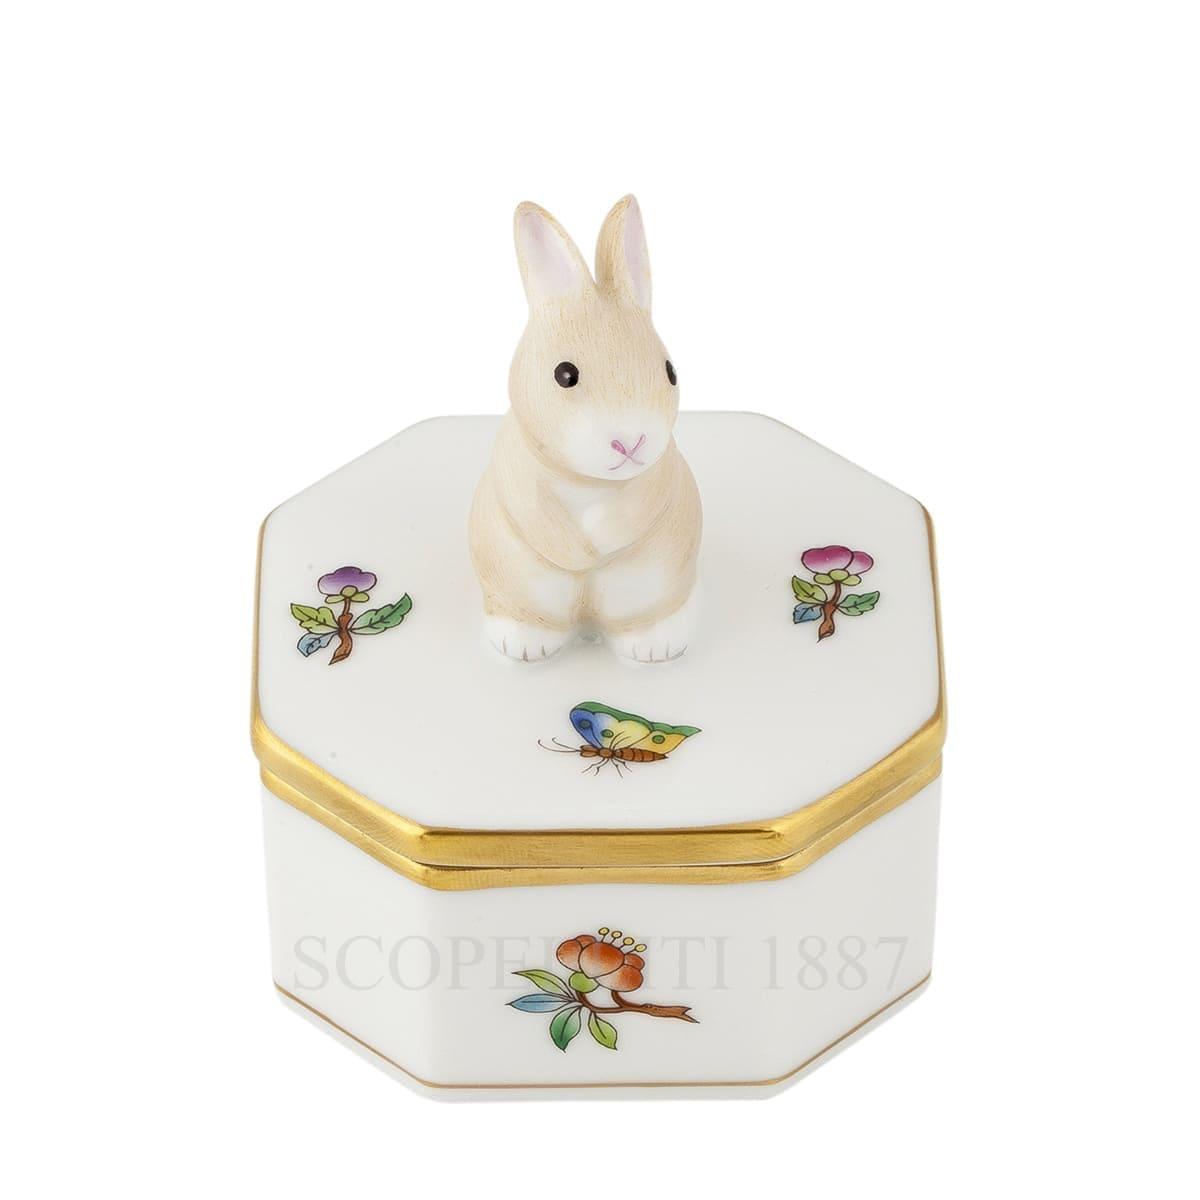 herend handpainted porcelain octagonal box with bunny queen victoria